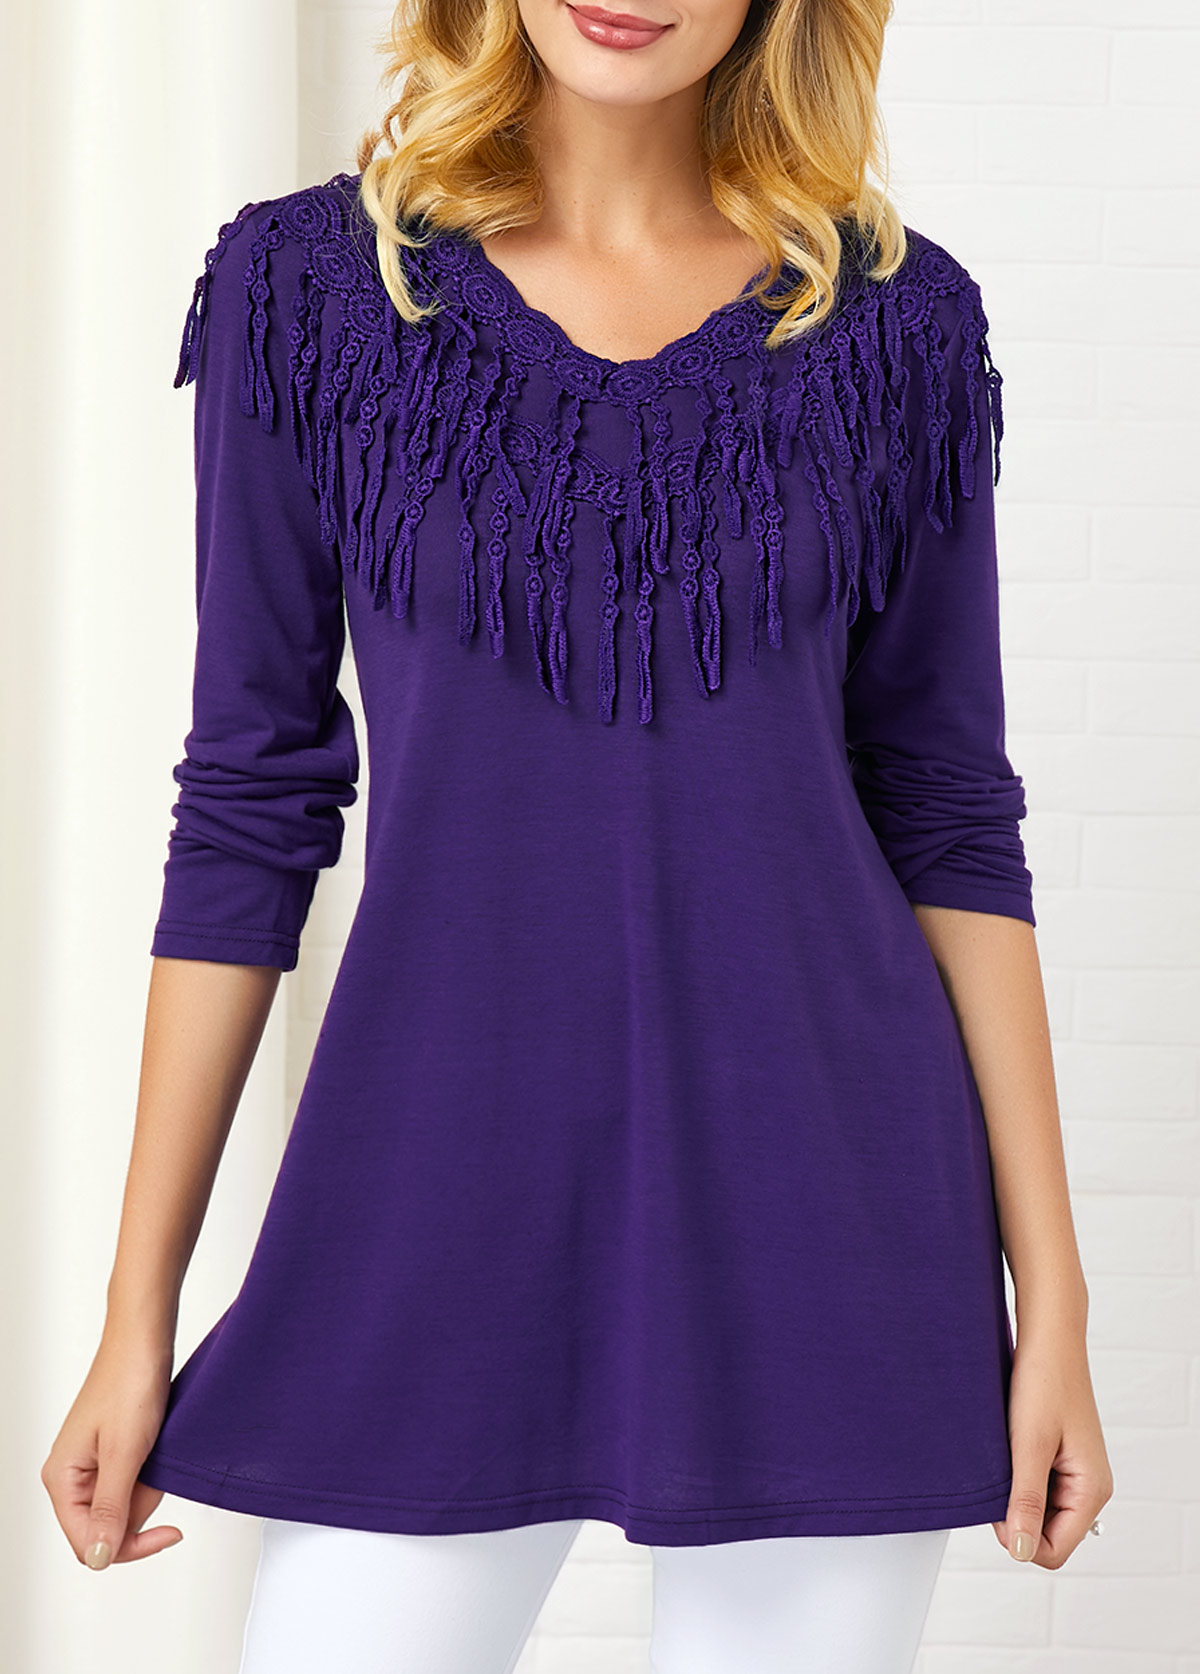 Lace Panel Long Sleeve Round Neck T Shirt